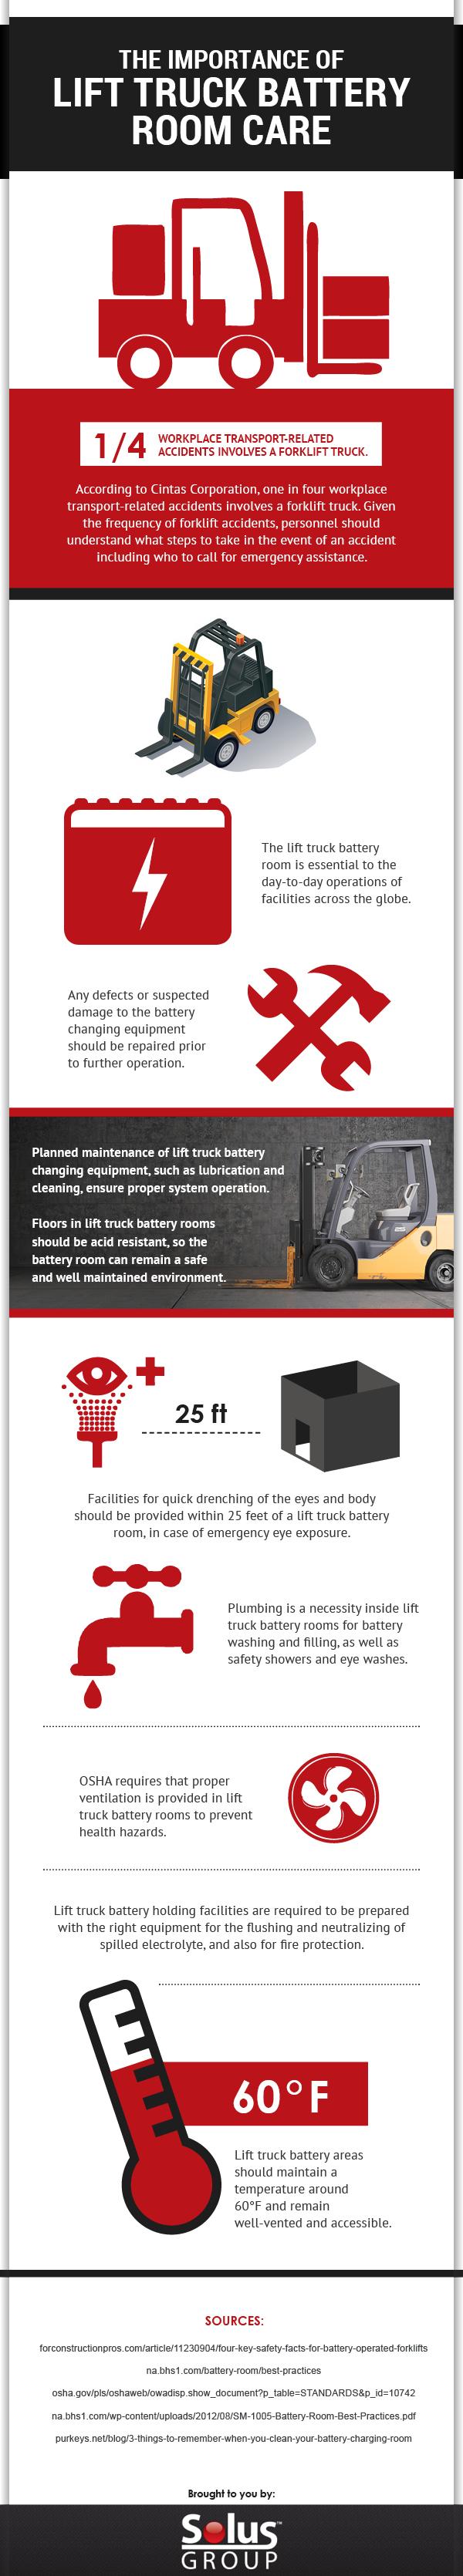 lift truck battery room